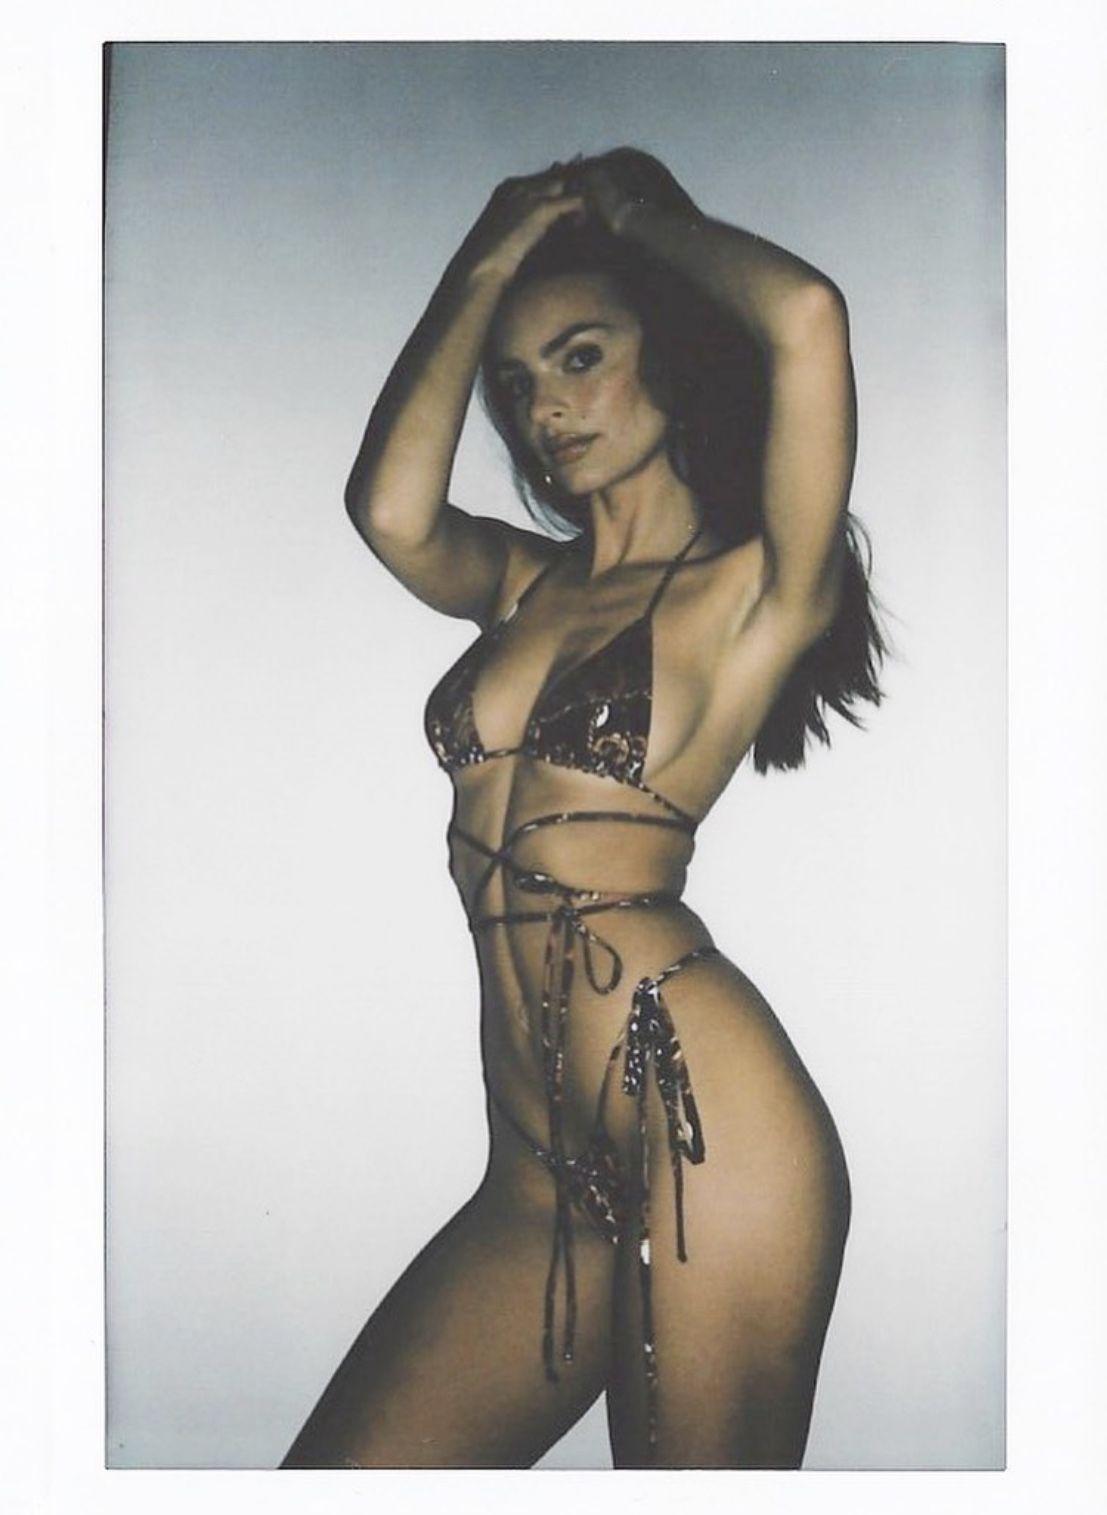 Dave recommends Lindsay lohan shows nude vigina pics